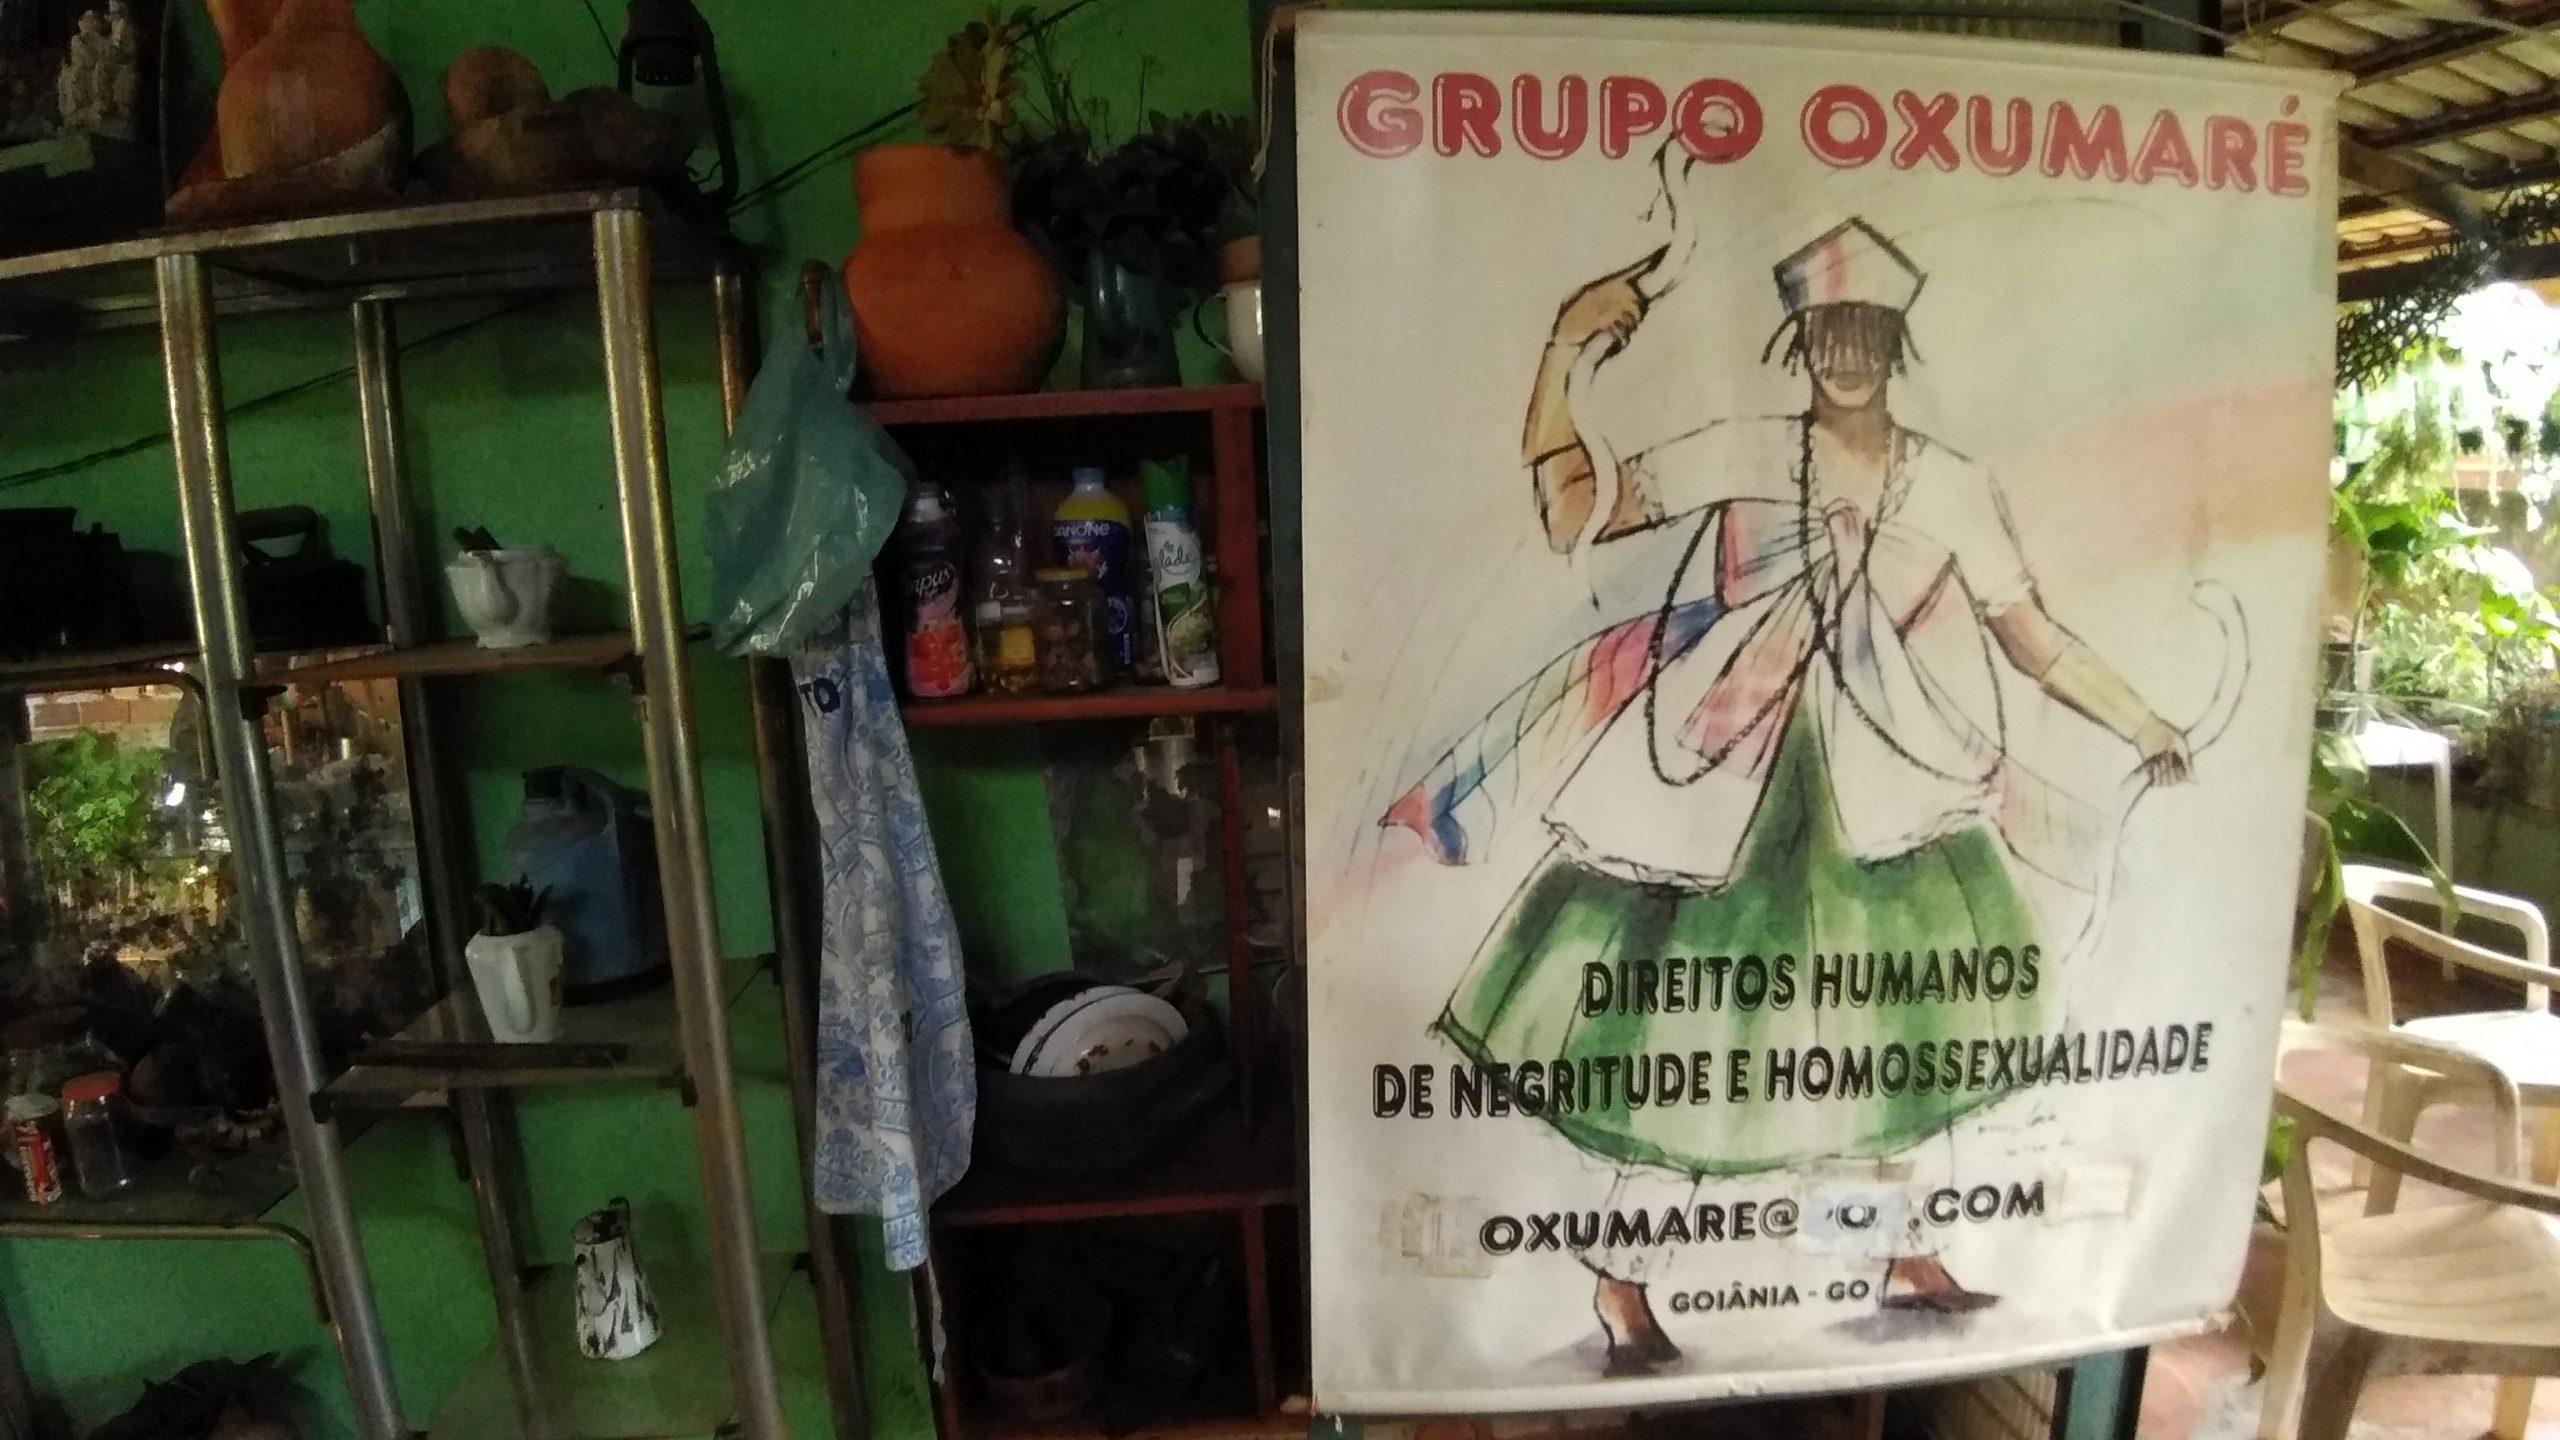 Grupo Oxumaré, organizado por Marco Aurélio e Luzia Basília, no Quilombo Vó Rita: defesa dos direitos humanos e da tolerância. Foto de Ludmila Almeida